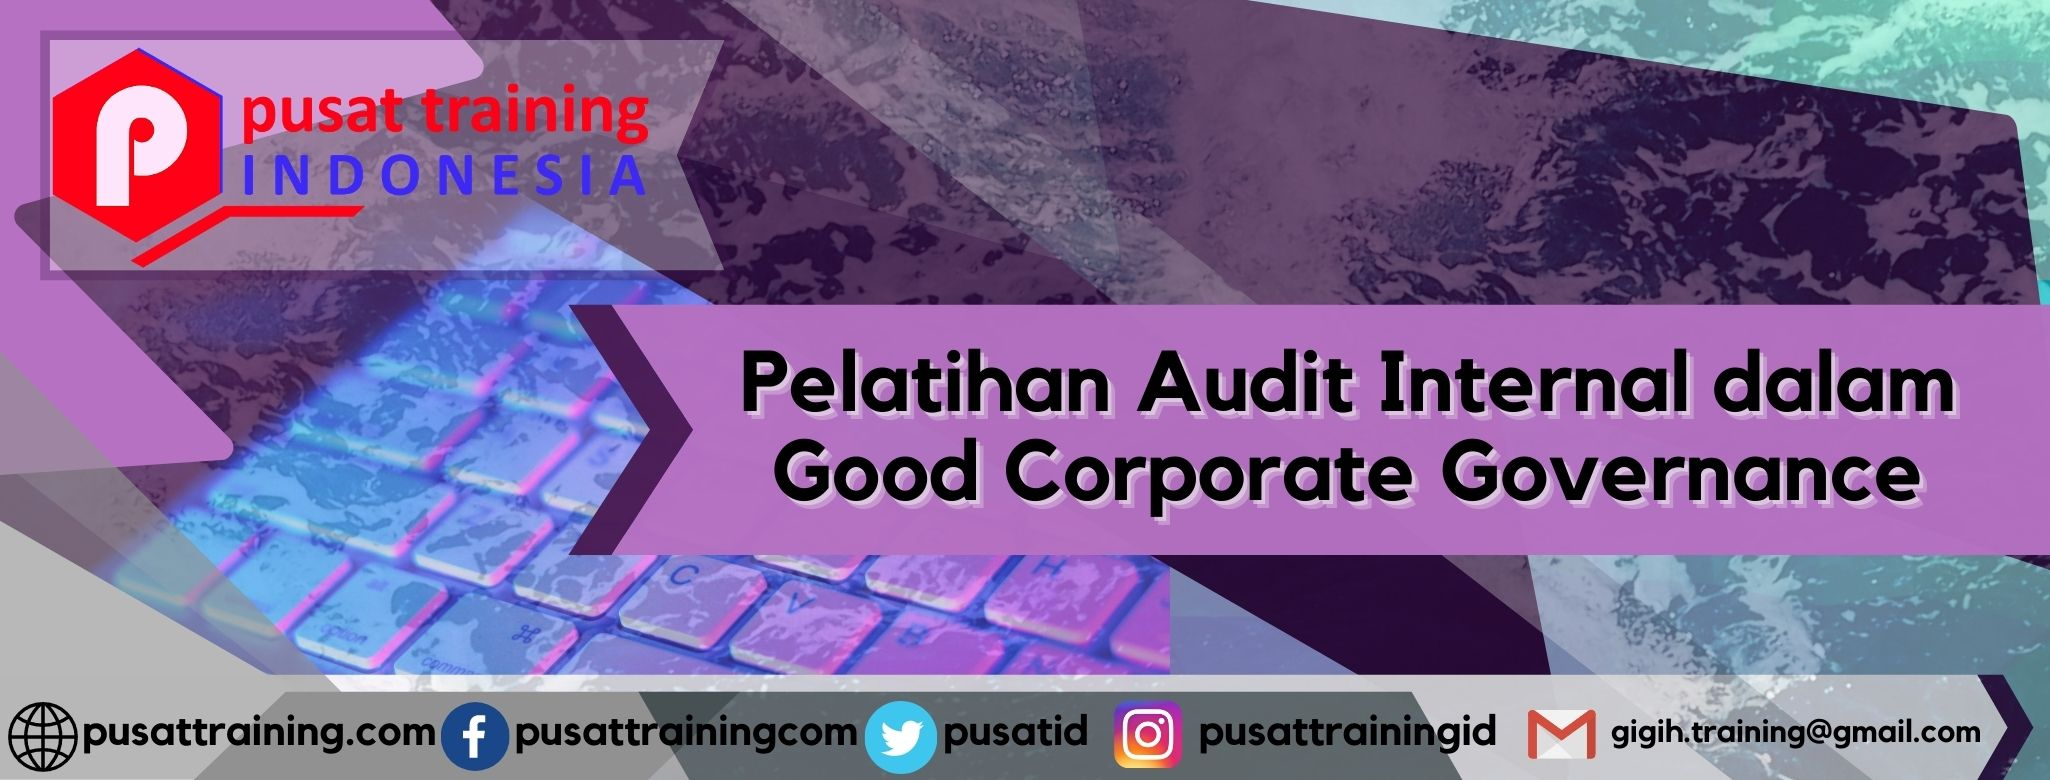 Pelatihan Audit Internal dalam Good Corporate Governance